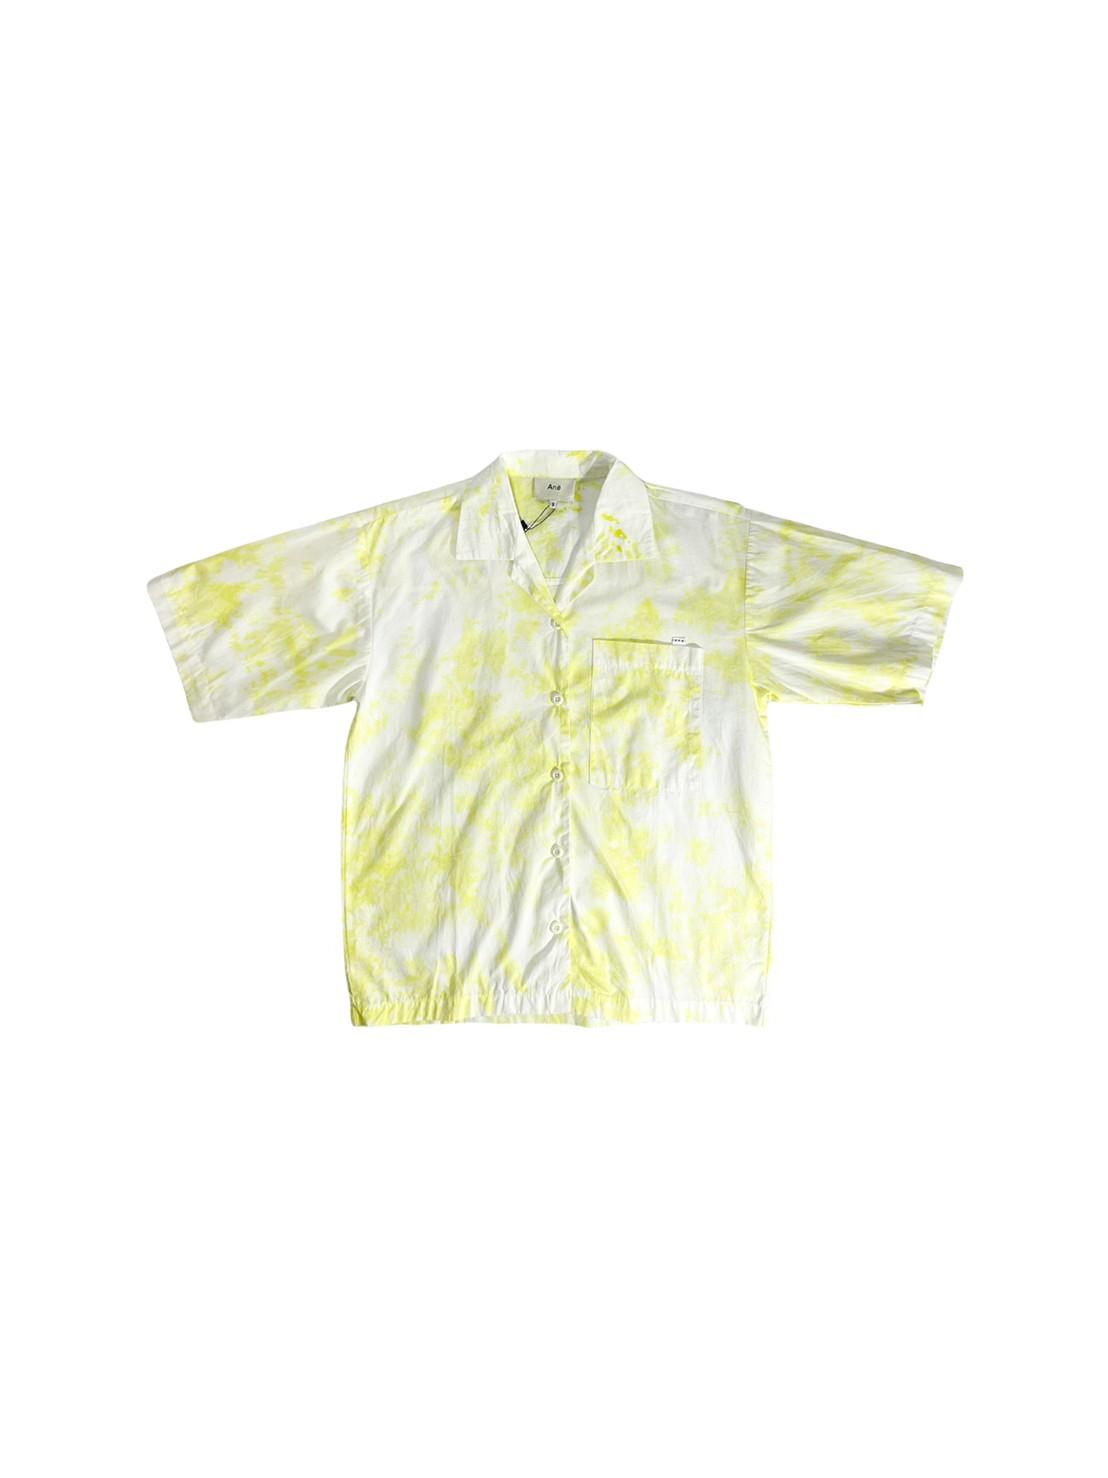 Ane Alexis shirt (Shine)